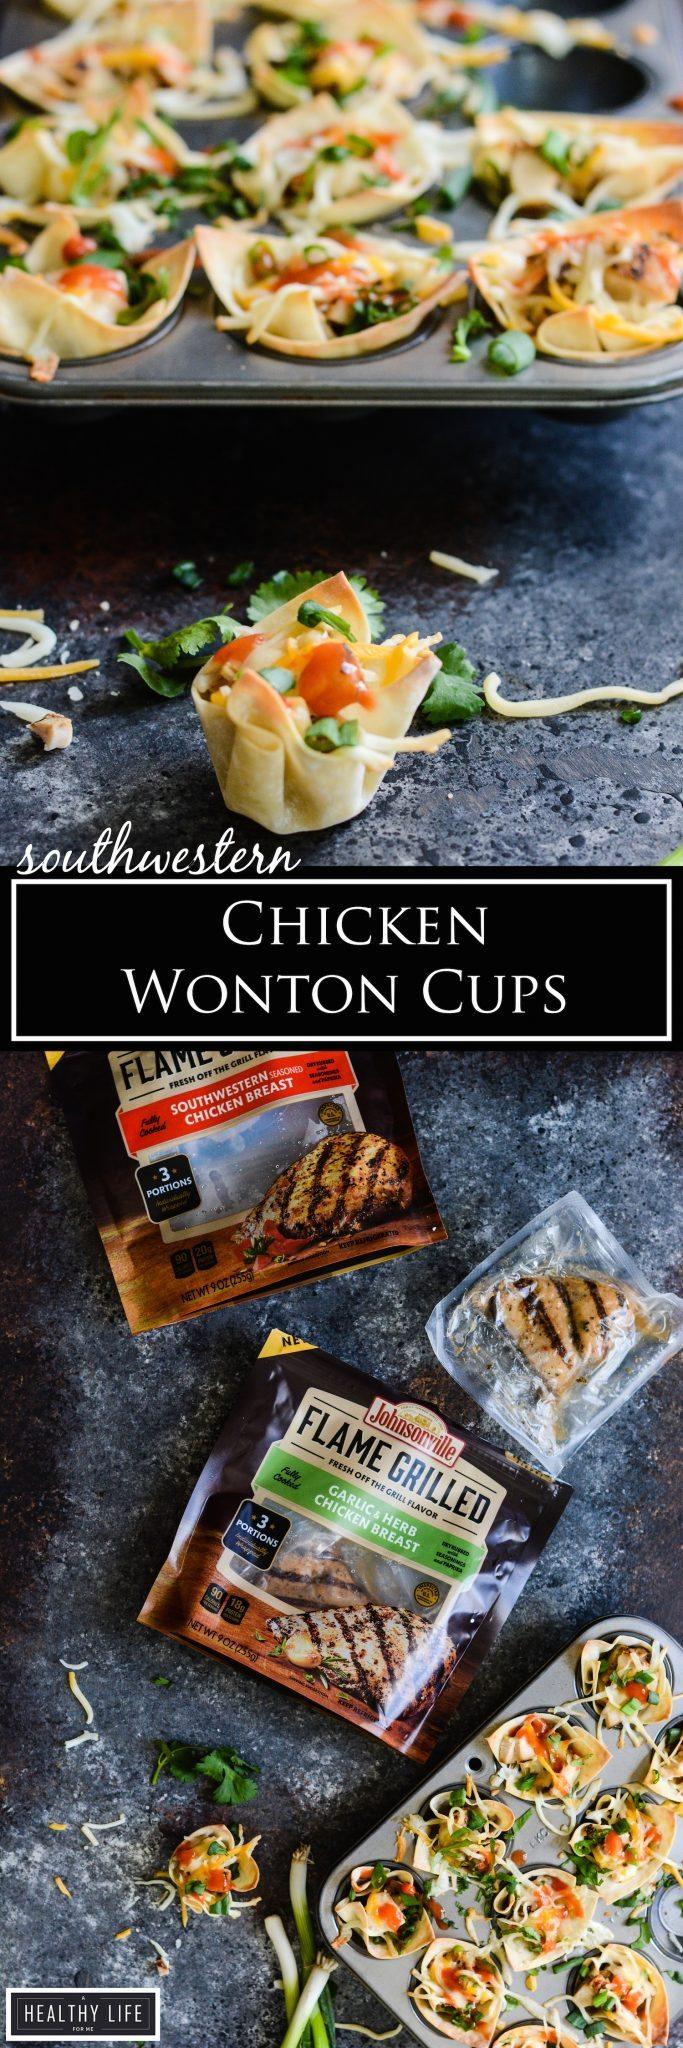 Southwestern Chicken Wonton Cups | ahealthylifeforme.com